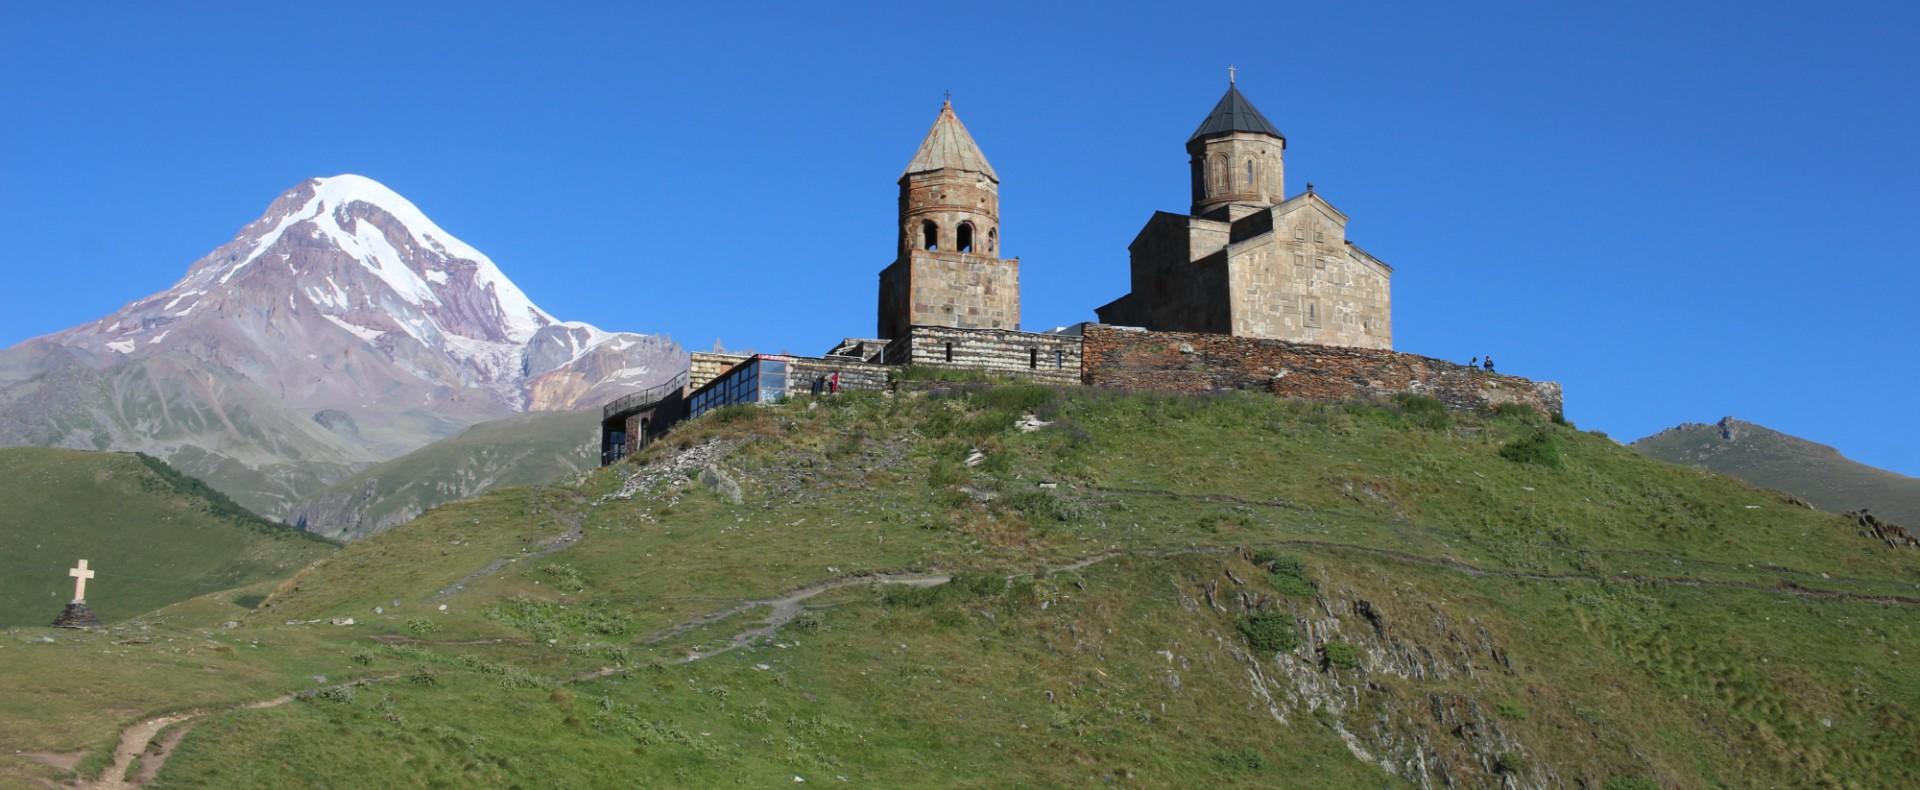 Gergeti Trinity Church, Kazbeg